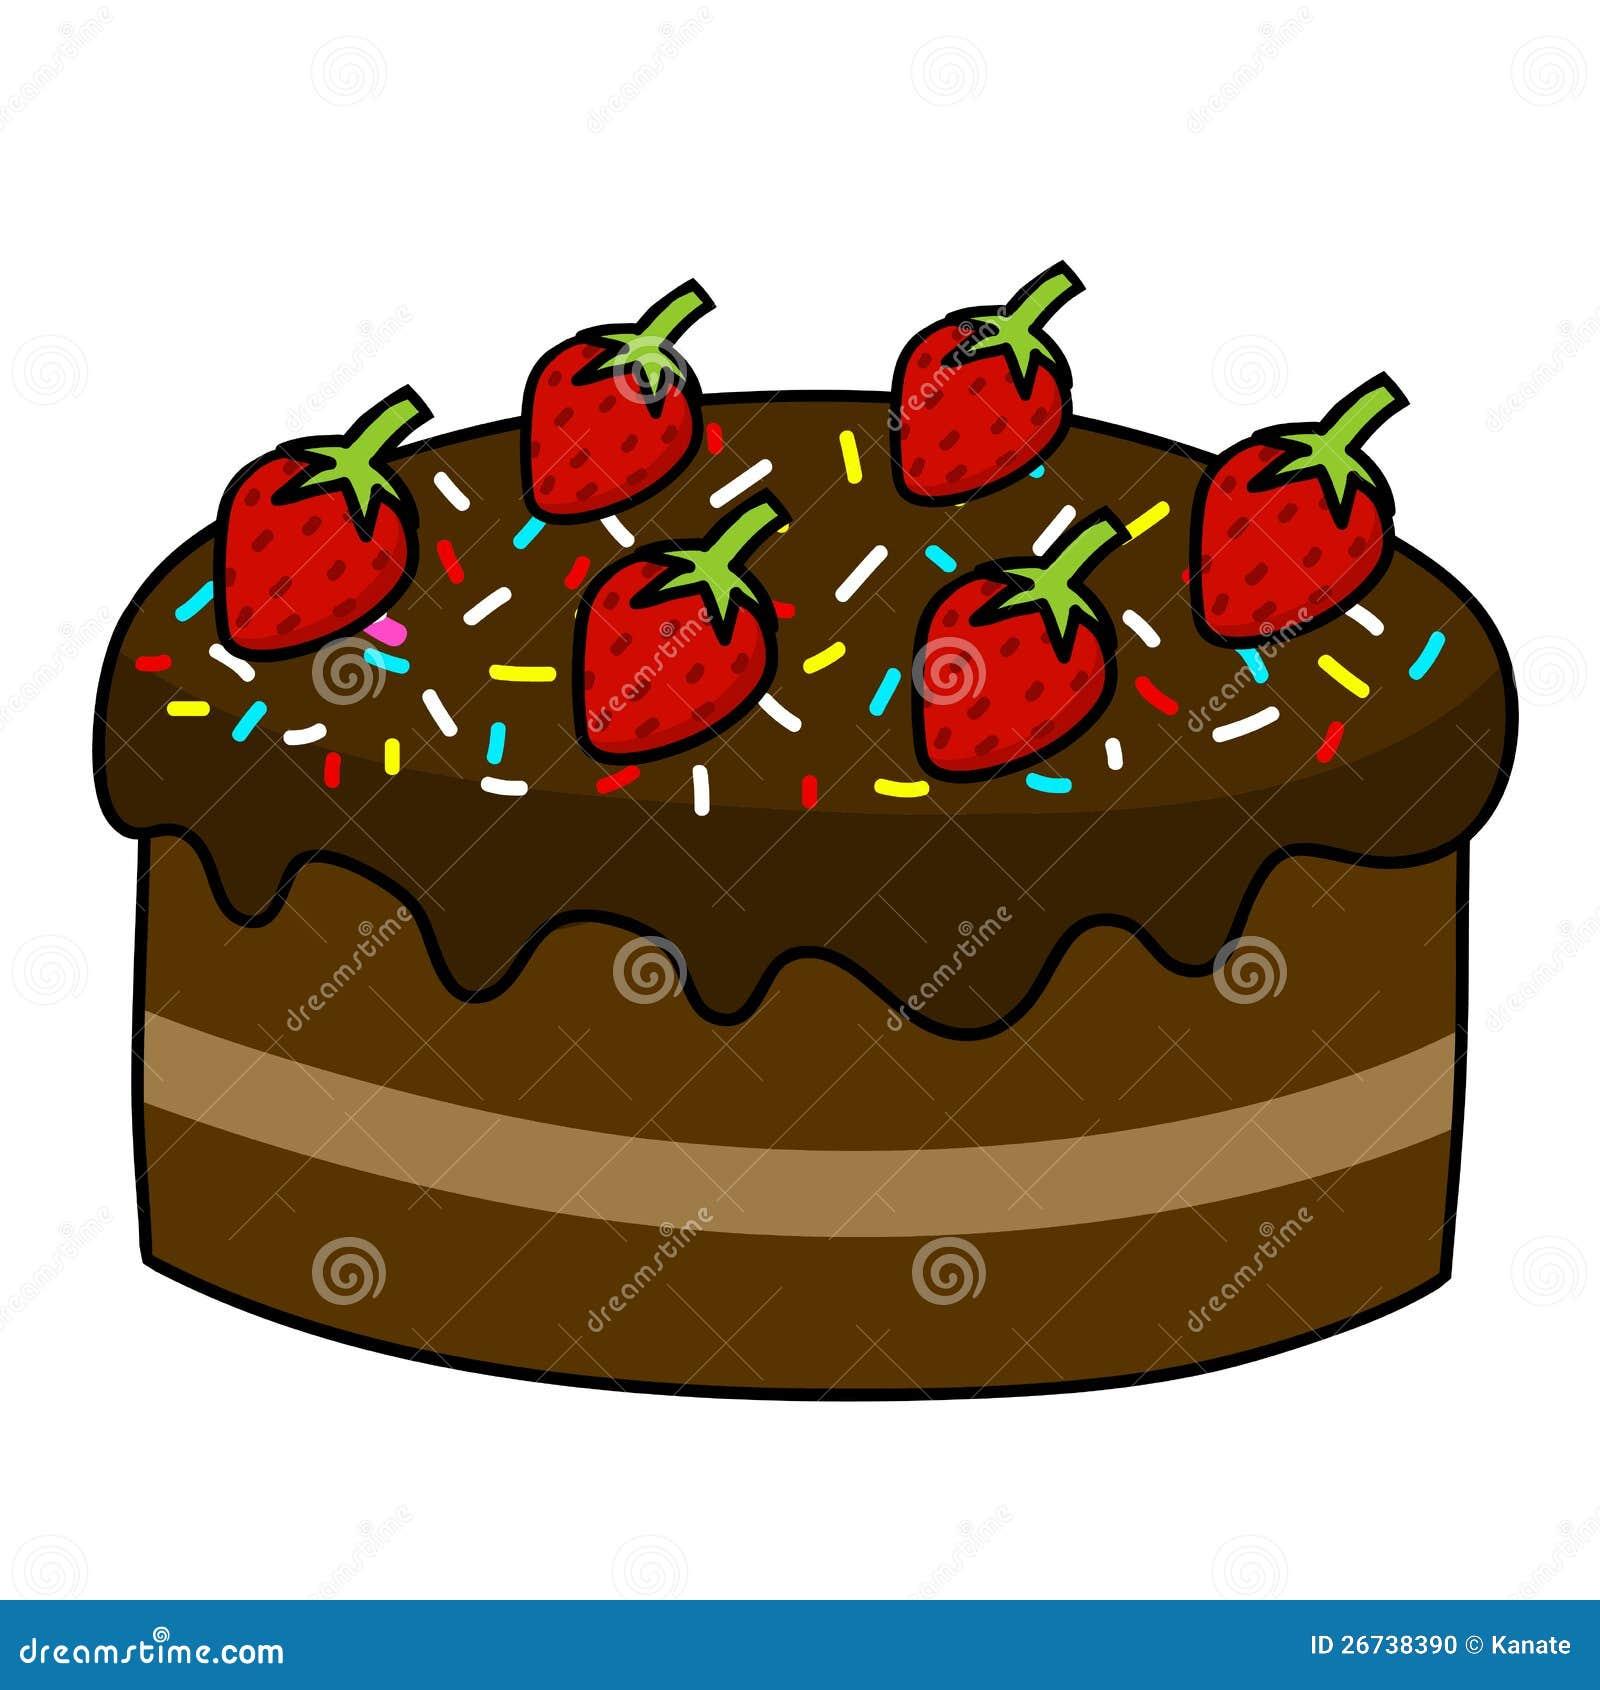 Cake Decoration Cartoon : Cartoon Cake Hand Drawing Stock Photo - Image: 26738390